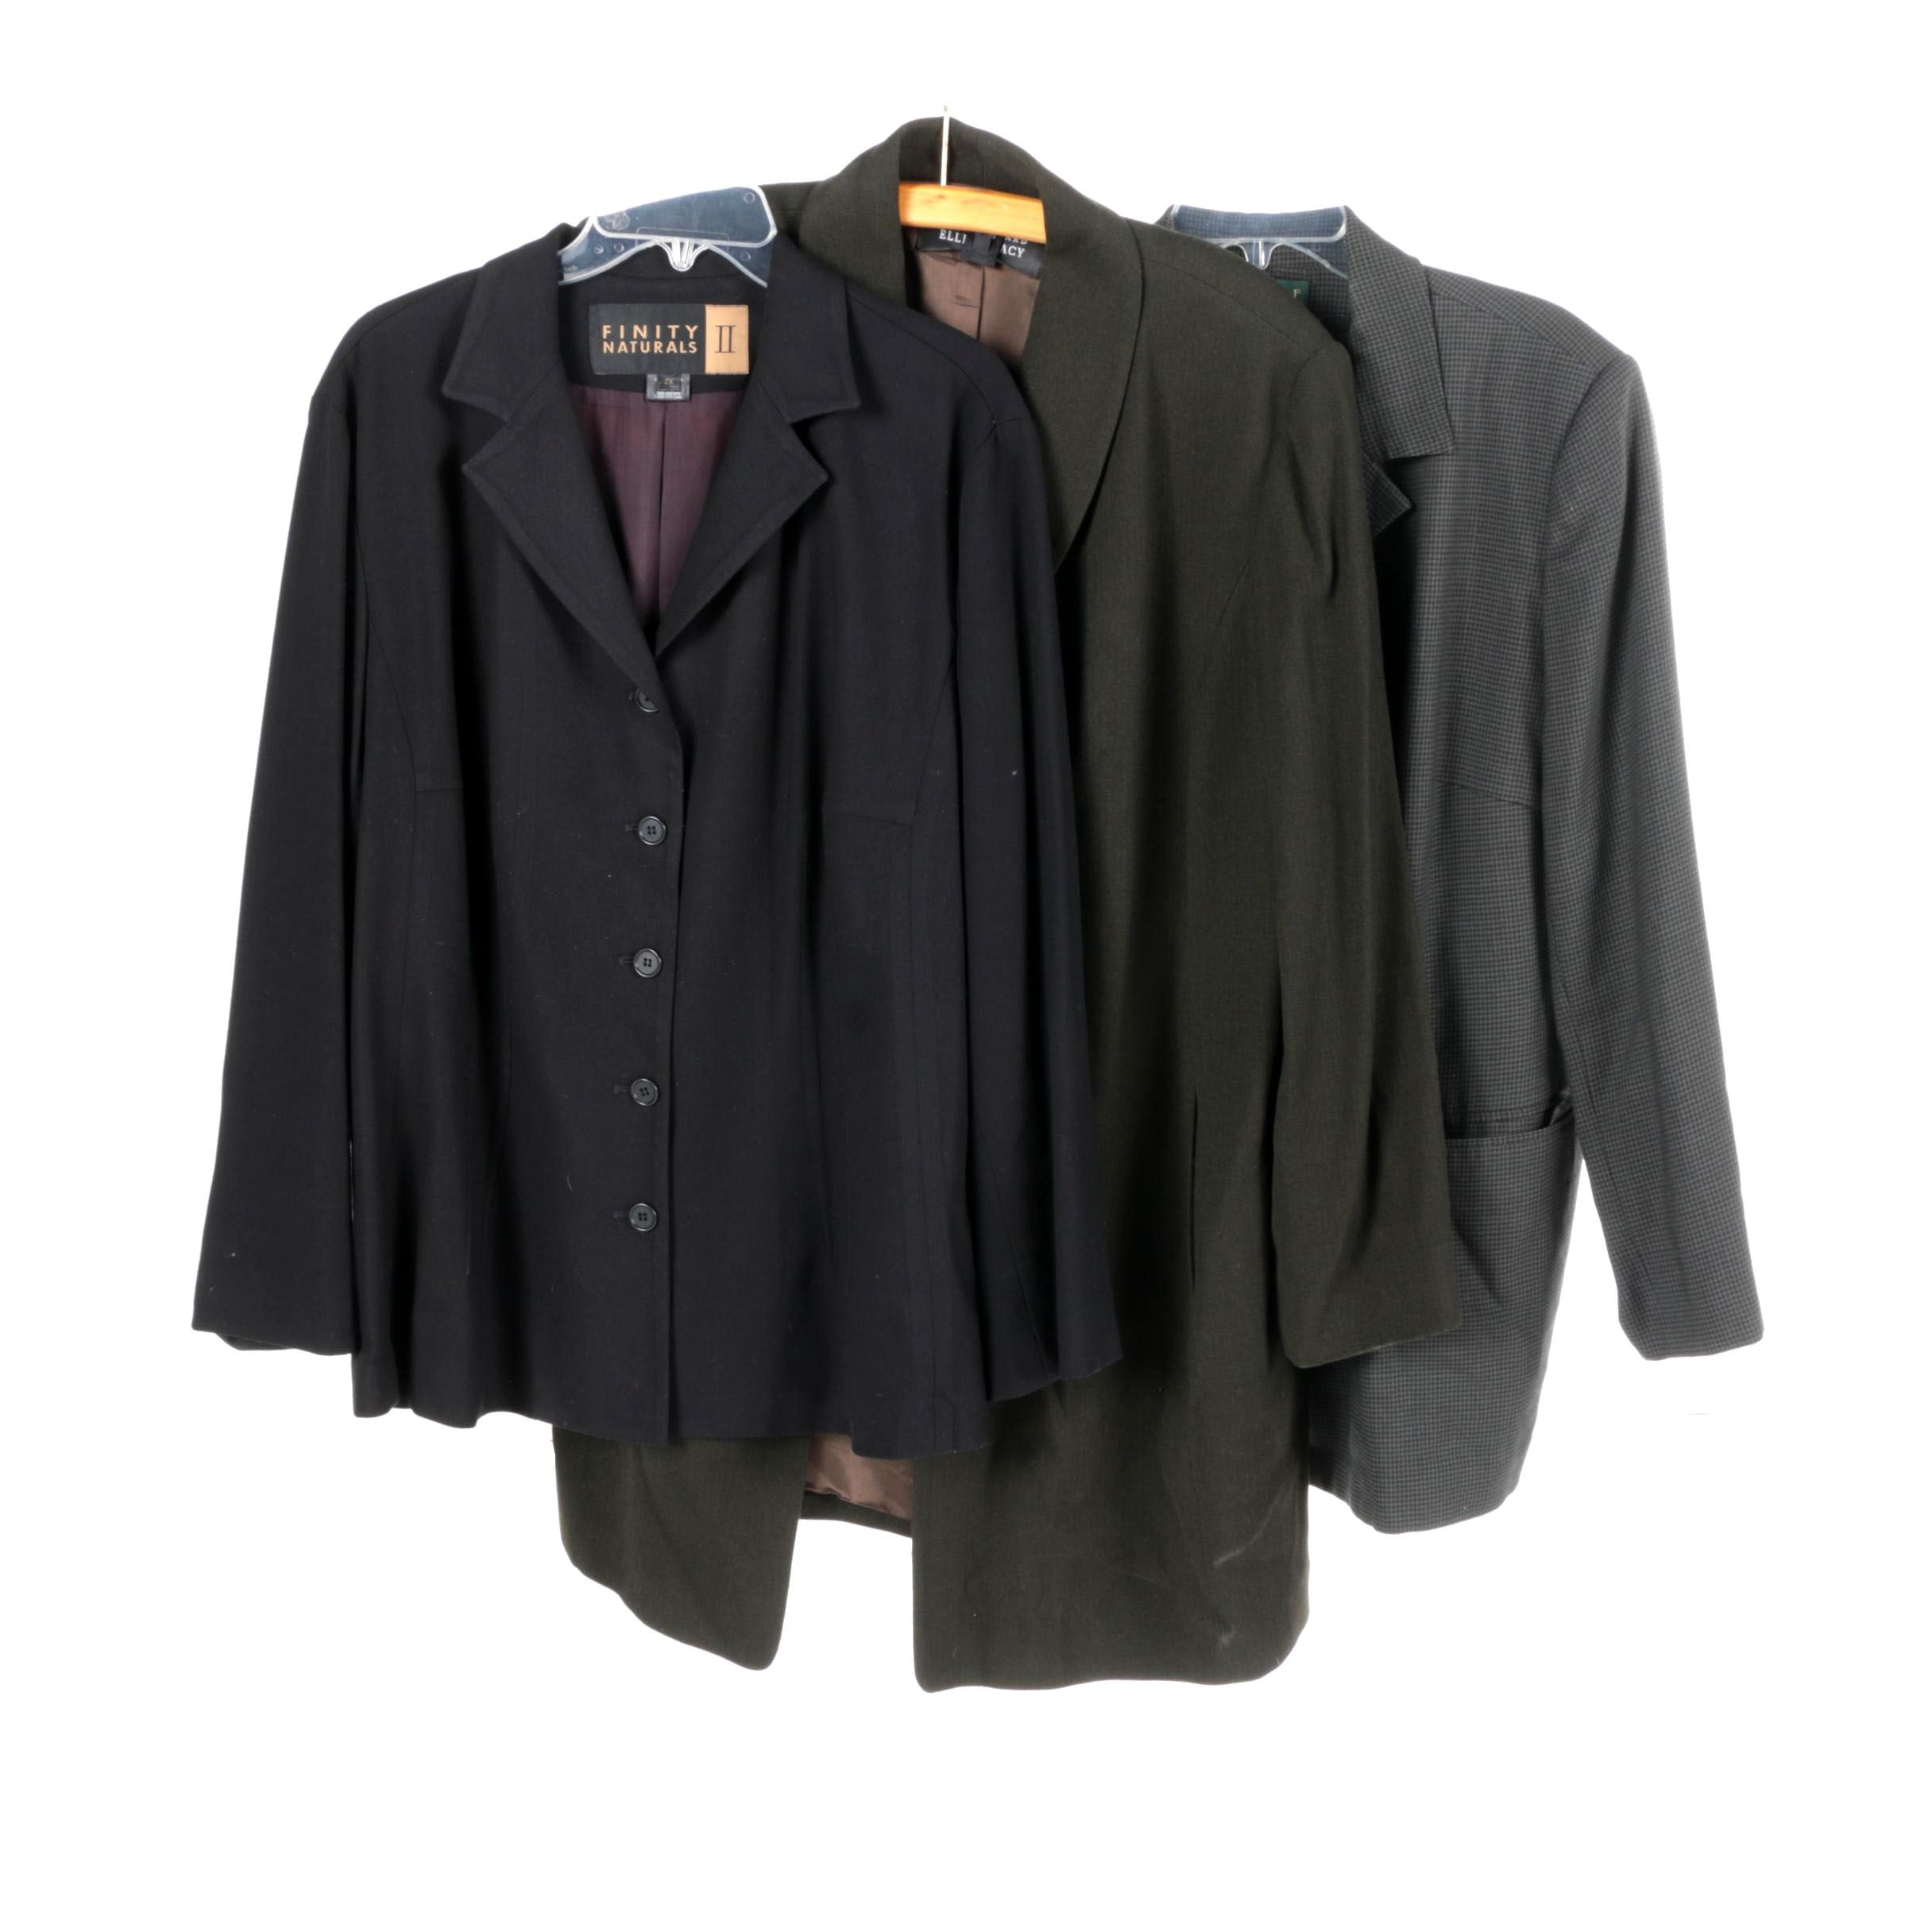 Women's Suit Jackets Including Vintage Harvé Benard by Benard Holtzman